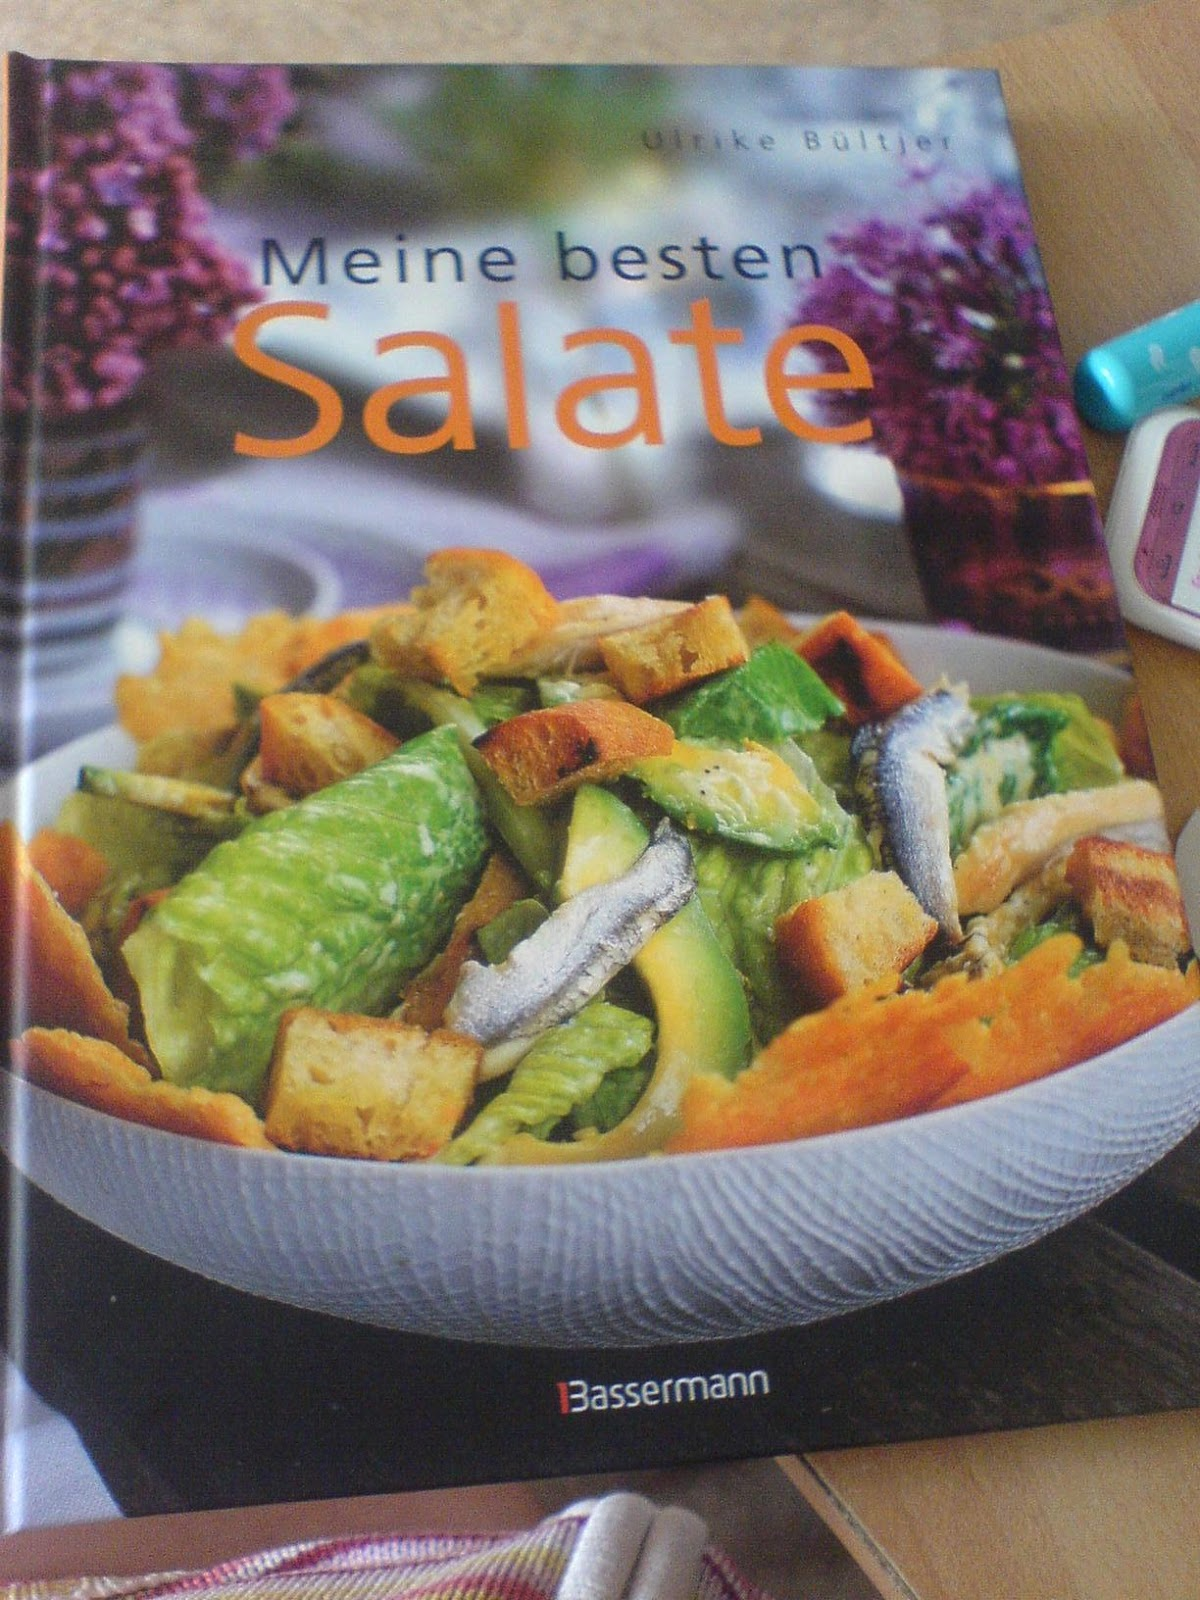 scattys b cherblog rezension kochb cher meine besten salate. Black Bedroom Furniture Sets. Home Design Ideas